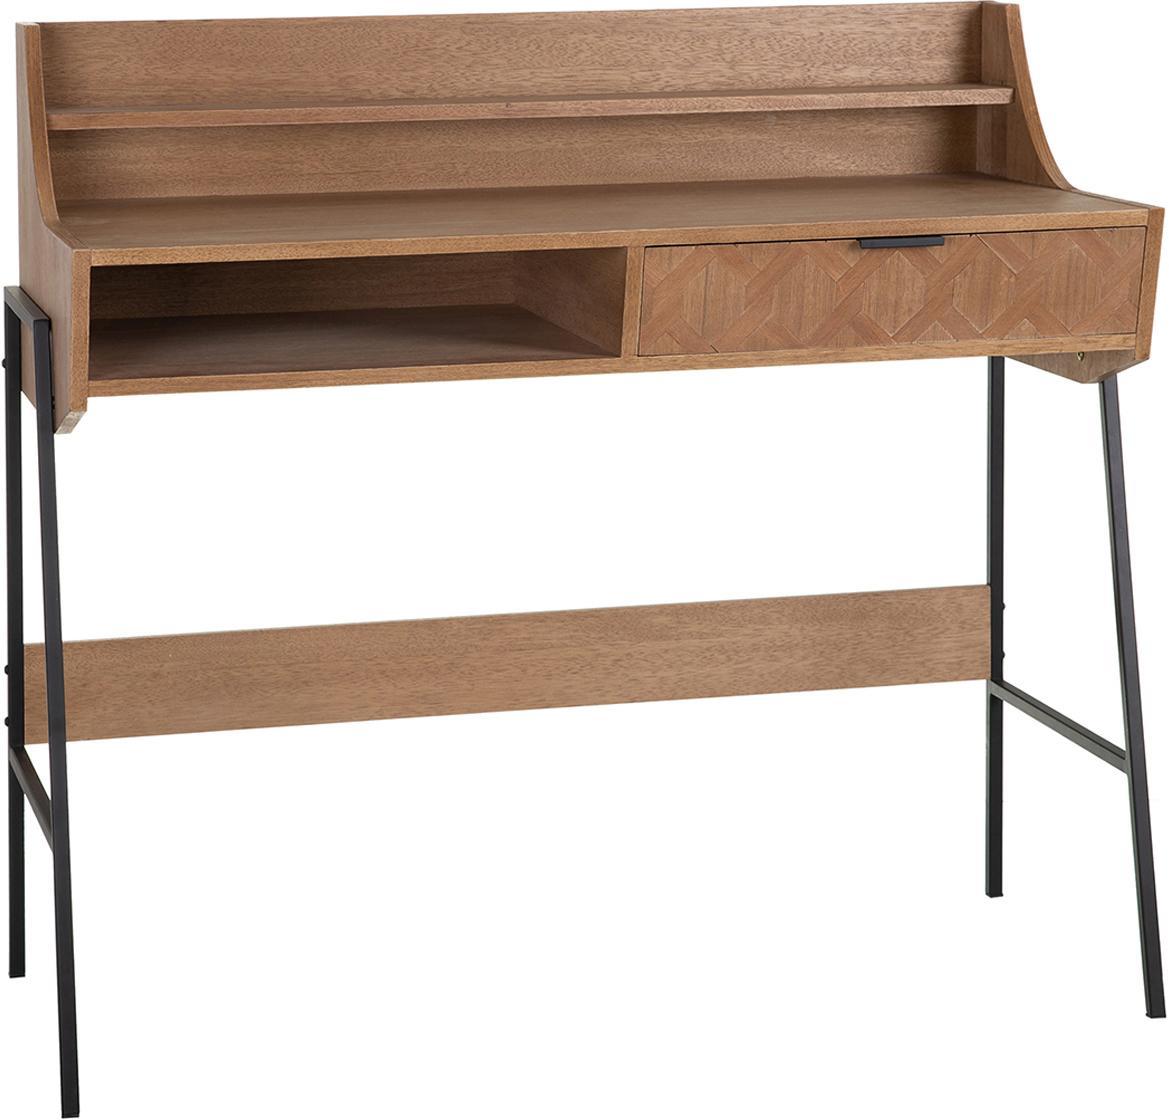 Escritorio Anne, Cuerpo: madera de fresno, tablero, Patas: metal, Fresno, negro, An 103 x Al 97 cm